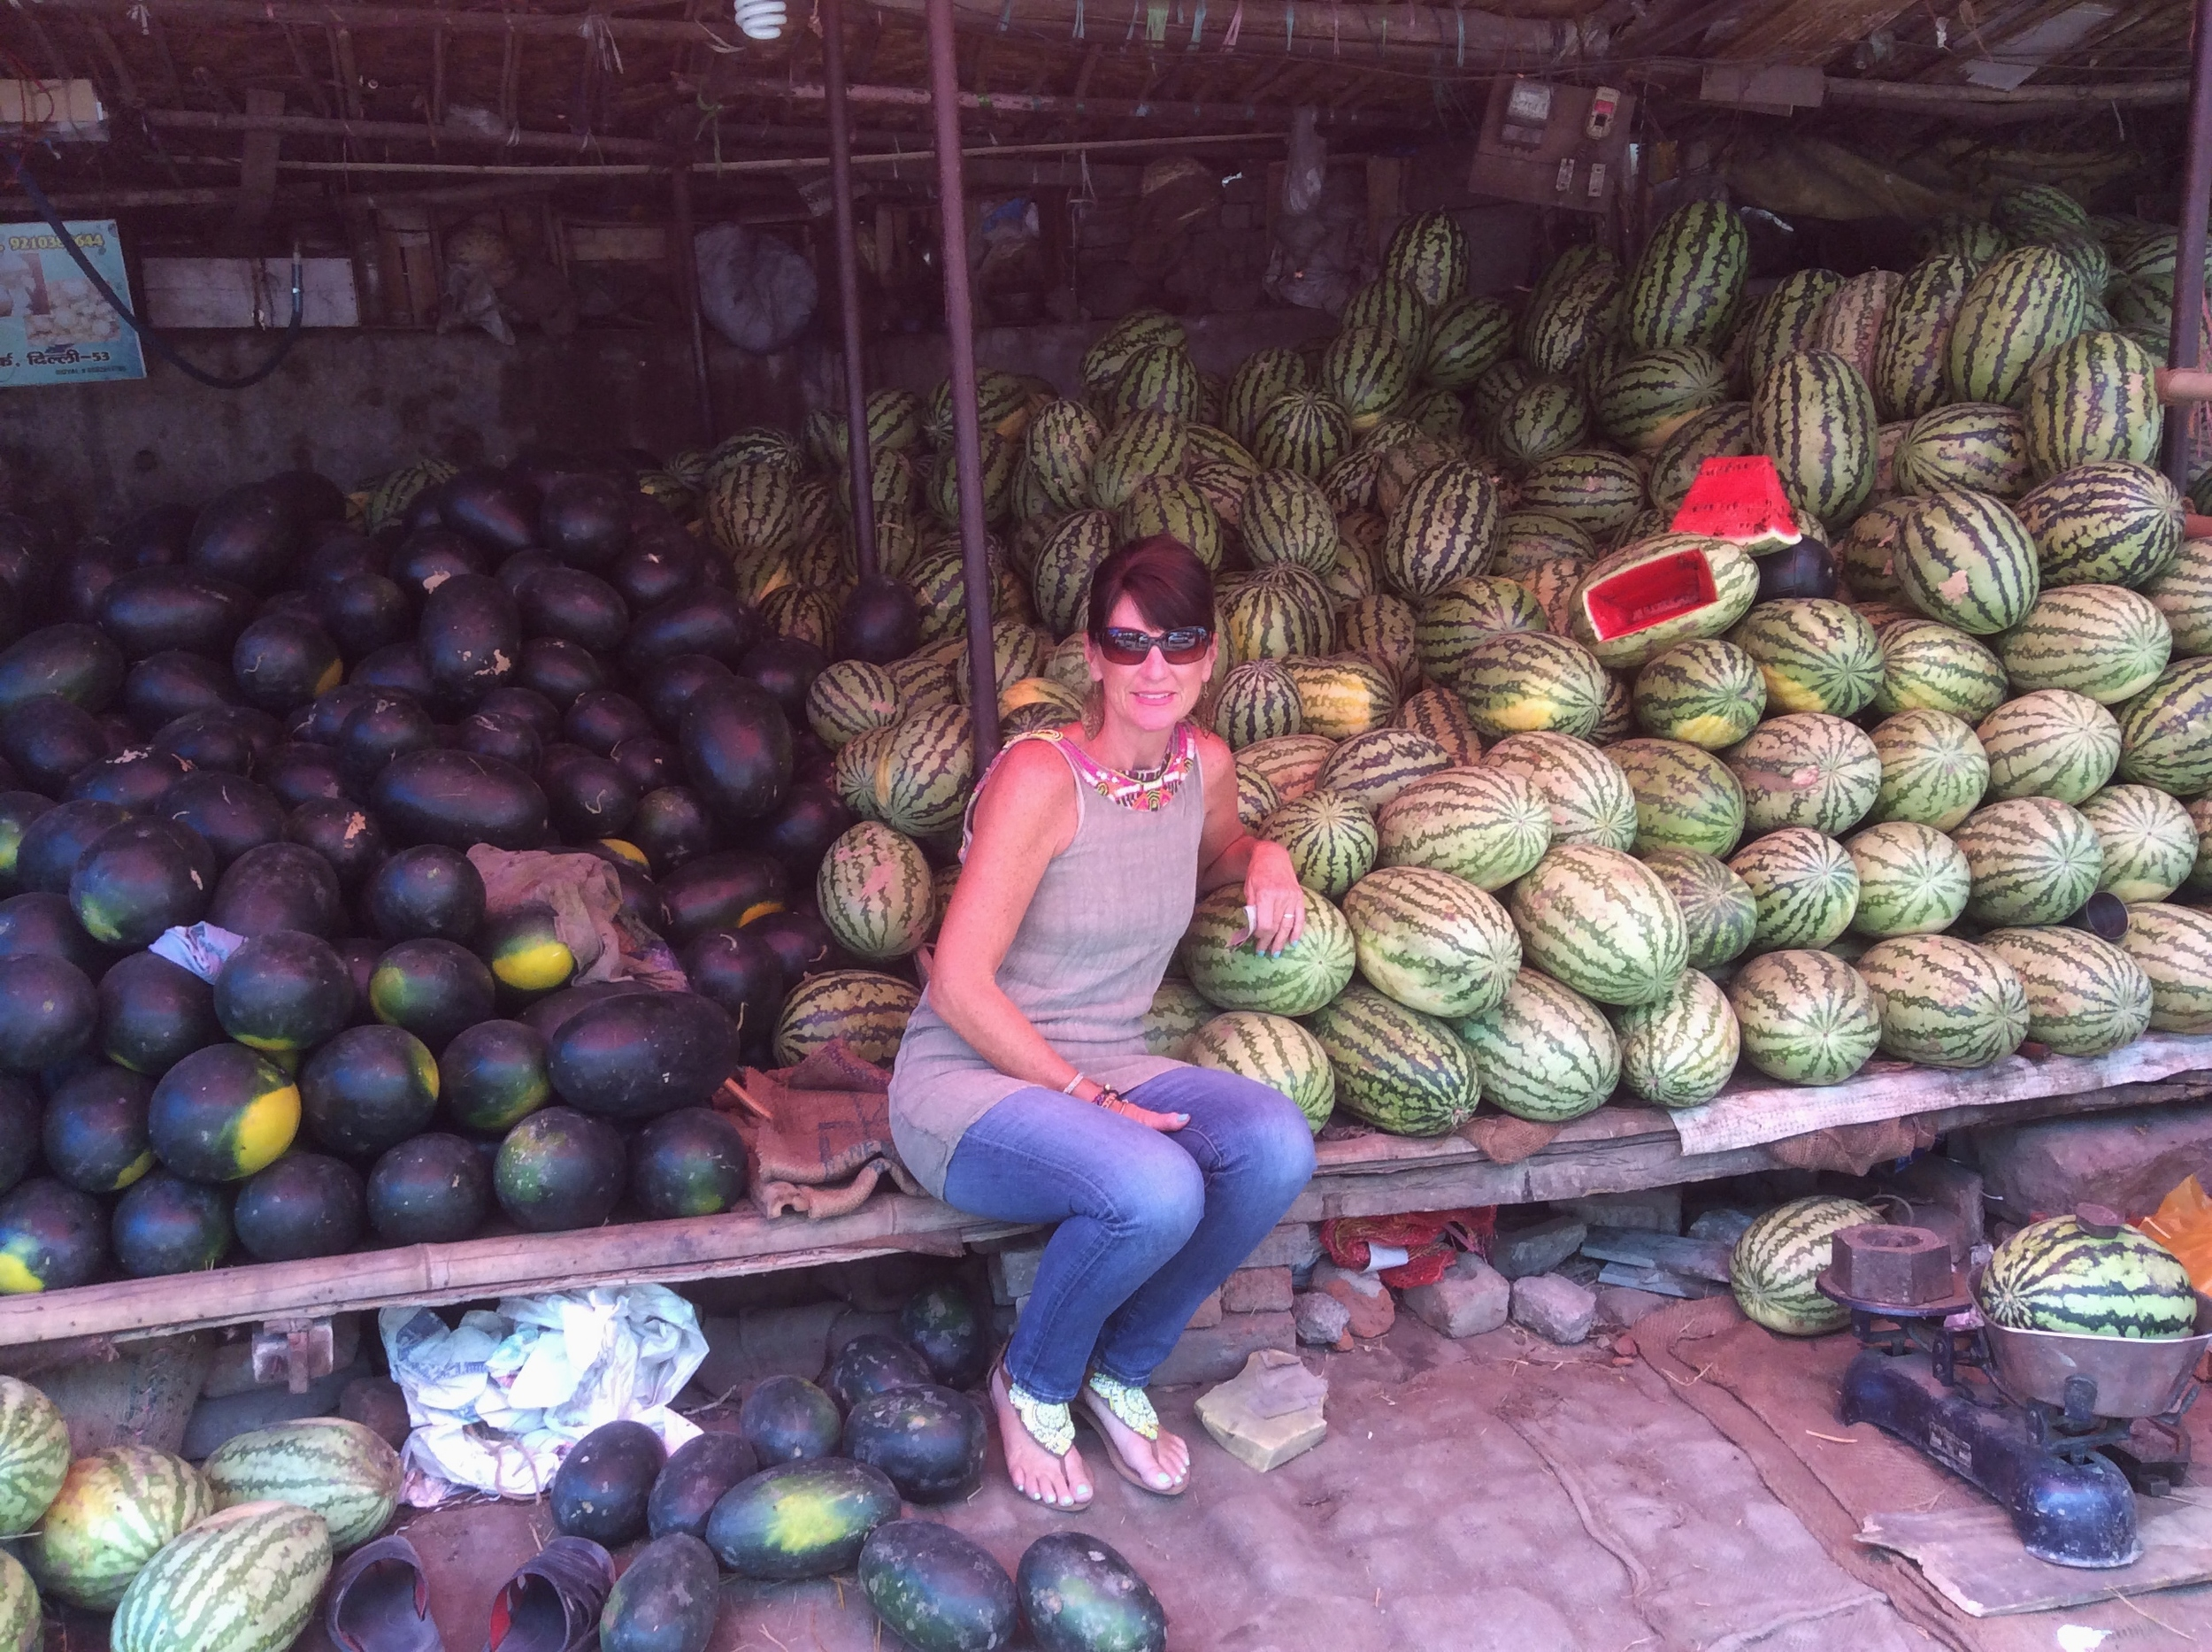 Watermelons in India.jpg